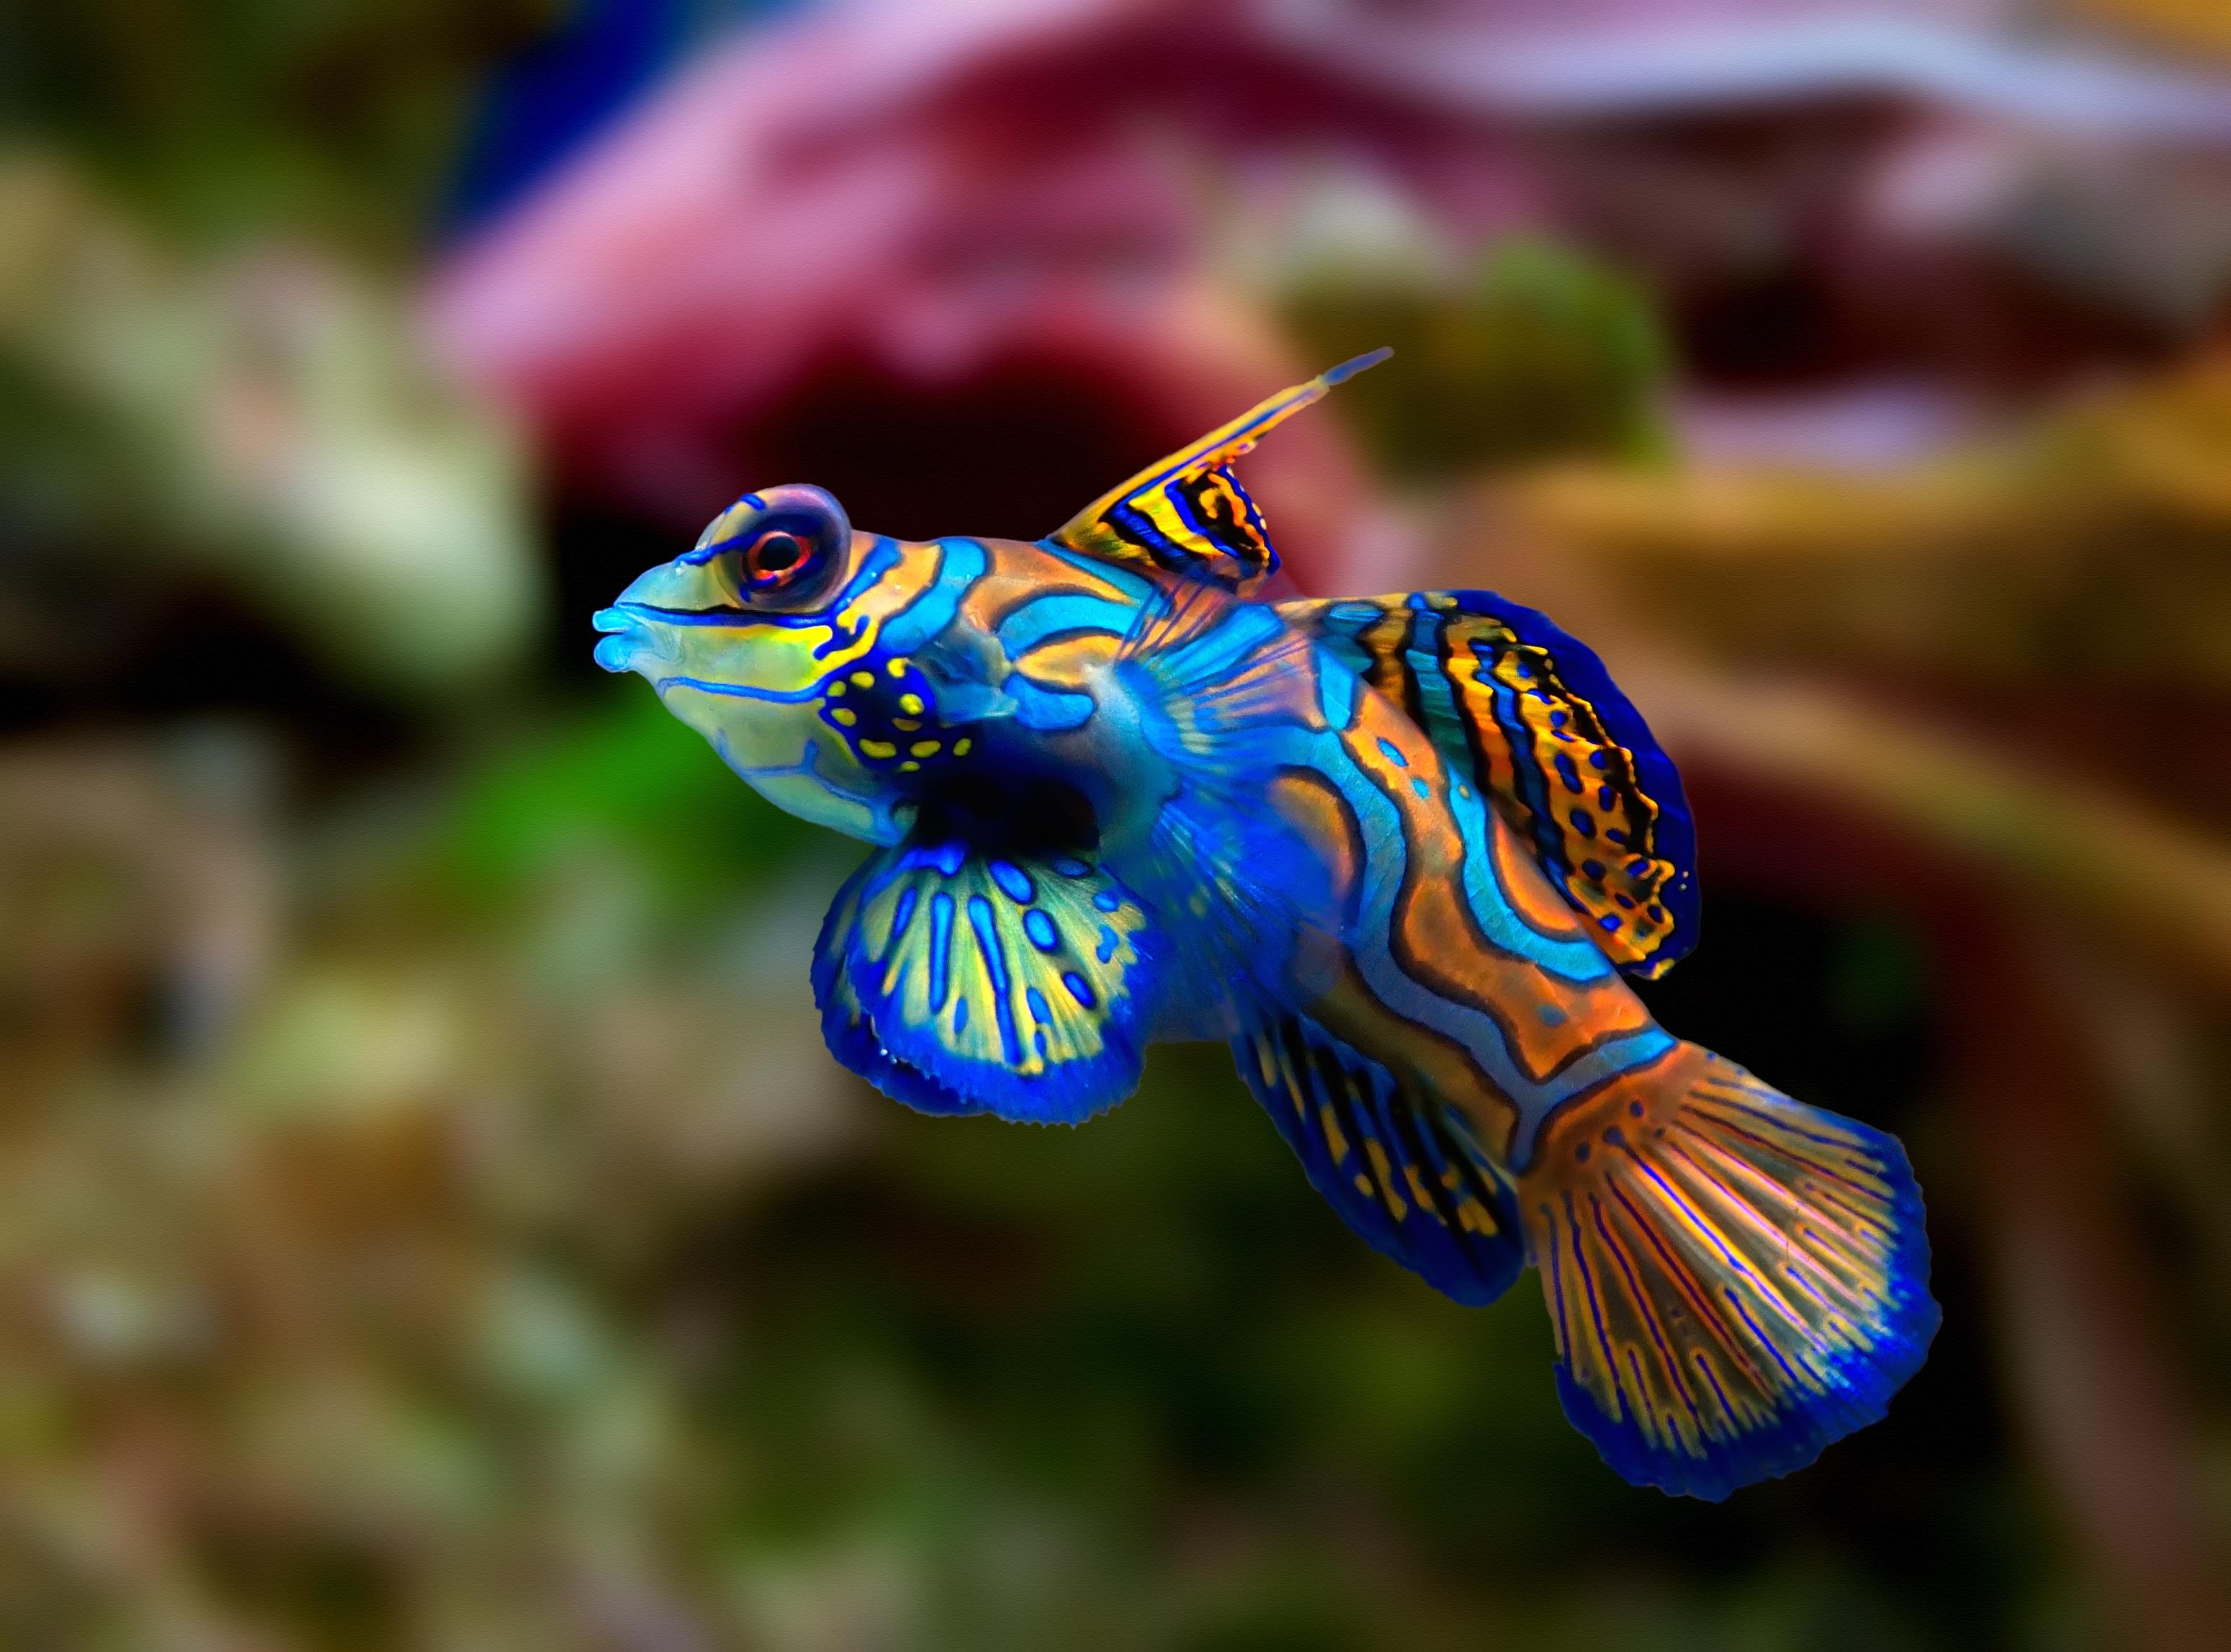 Hervorragend Mandarinfisch – Wikipedia CL31